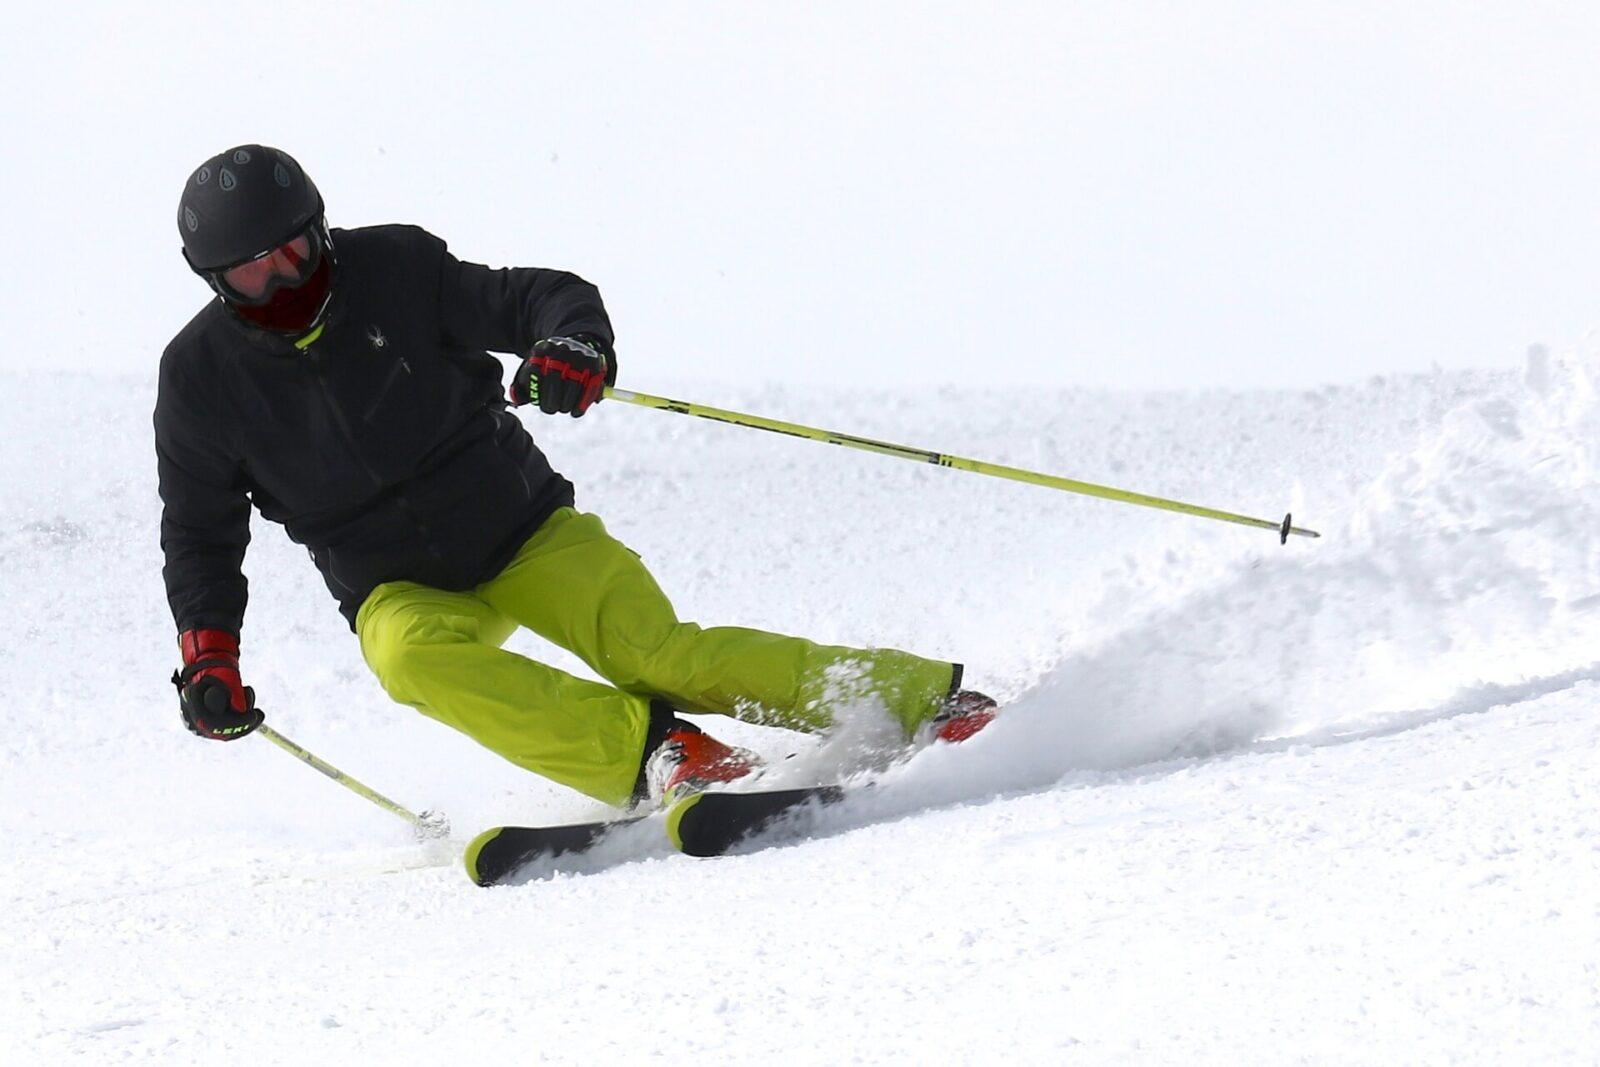 Iti place sa schiezi Iata 3 lucruri pe care trebuie sa le pui la punct inainte de a pleca pe partie 1